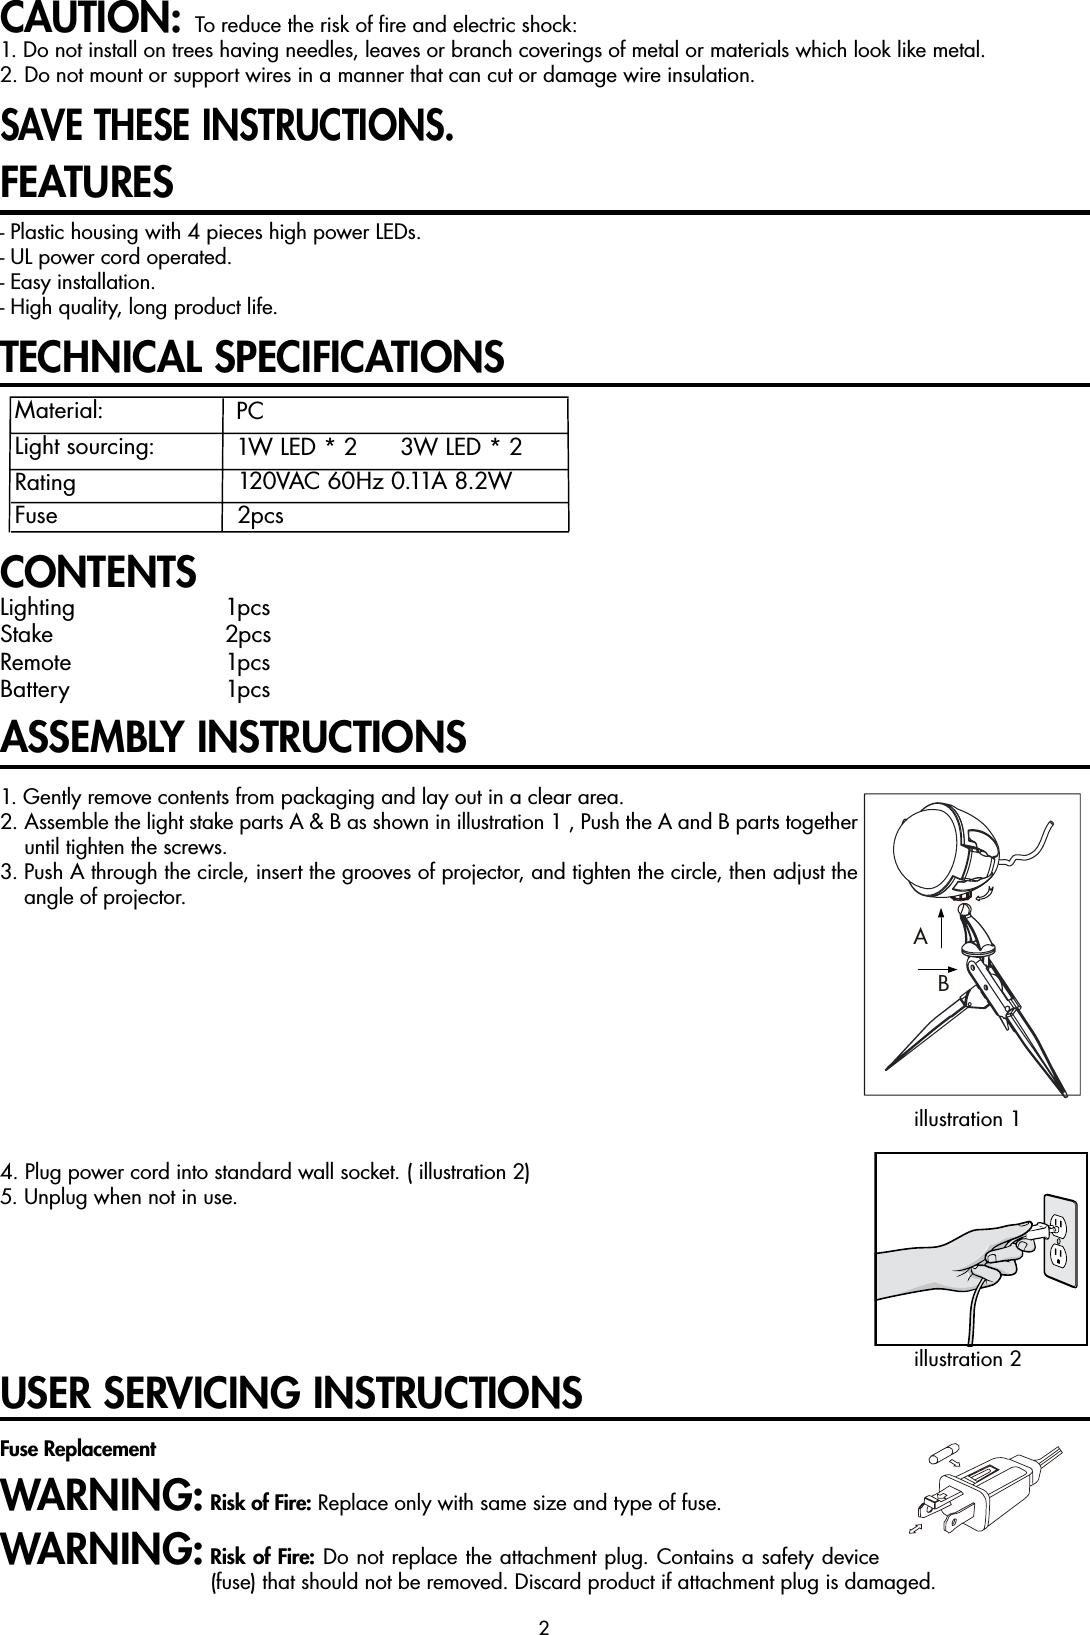 Gemmy Manuals